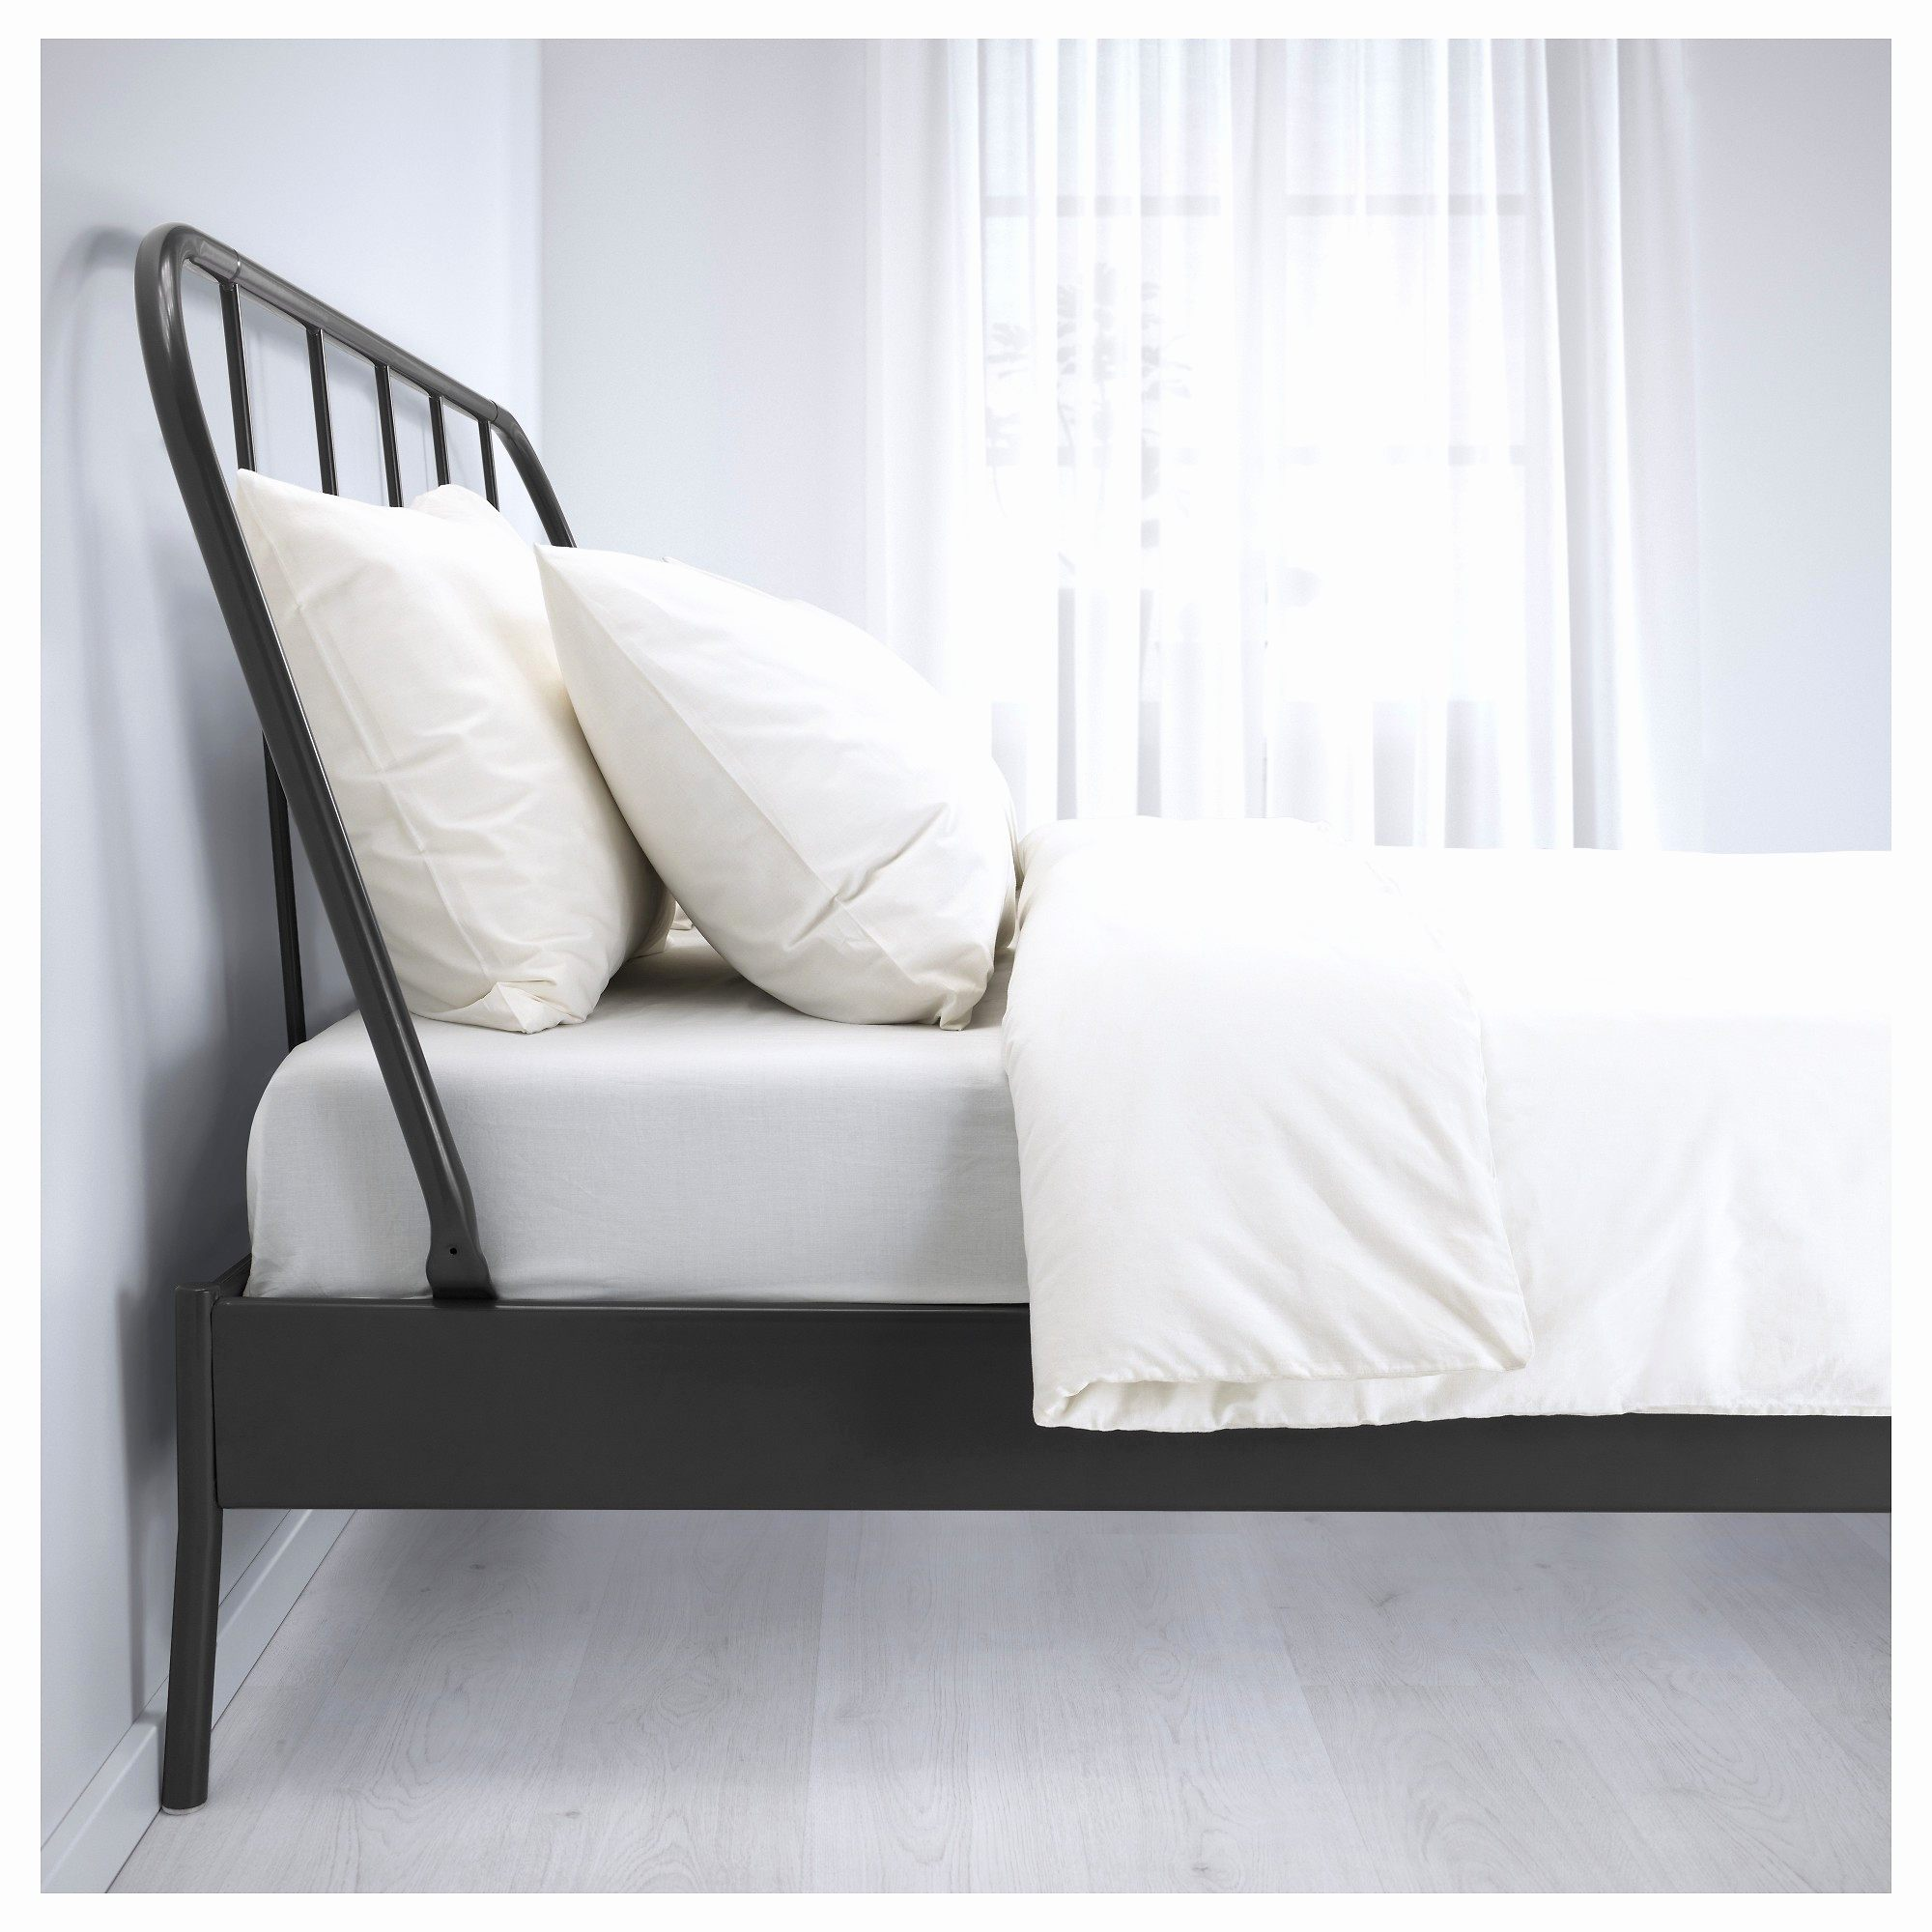 Cadre De Lit 160×200 Sans sommier Luxe sommier Lit 160—200 Beau Lit sommier Matelas Ikea – Famfgfo Maison